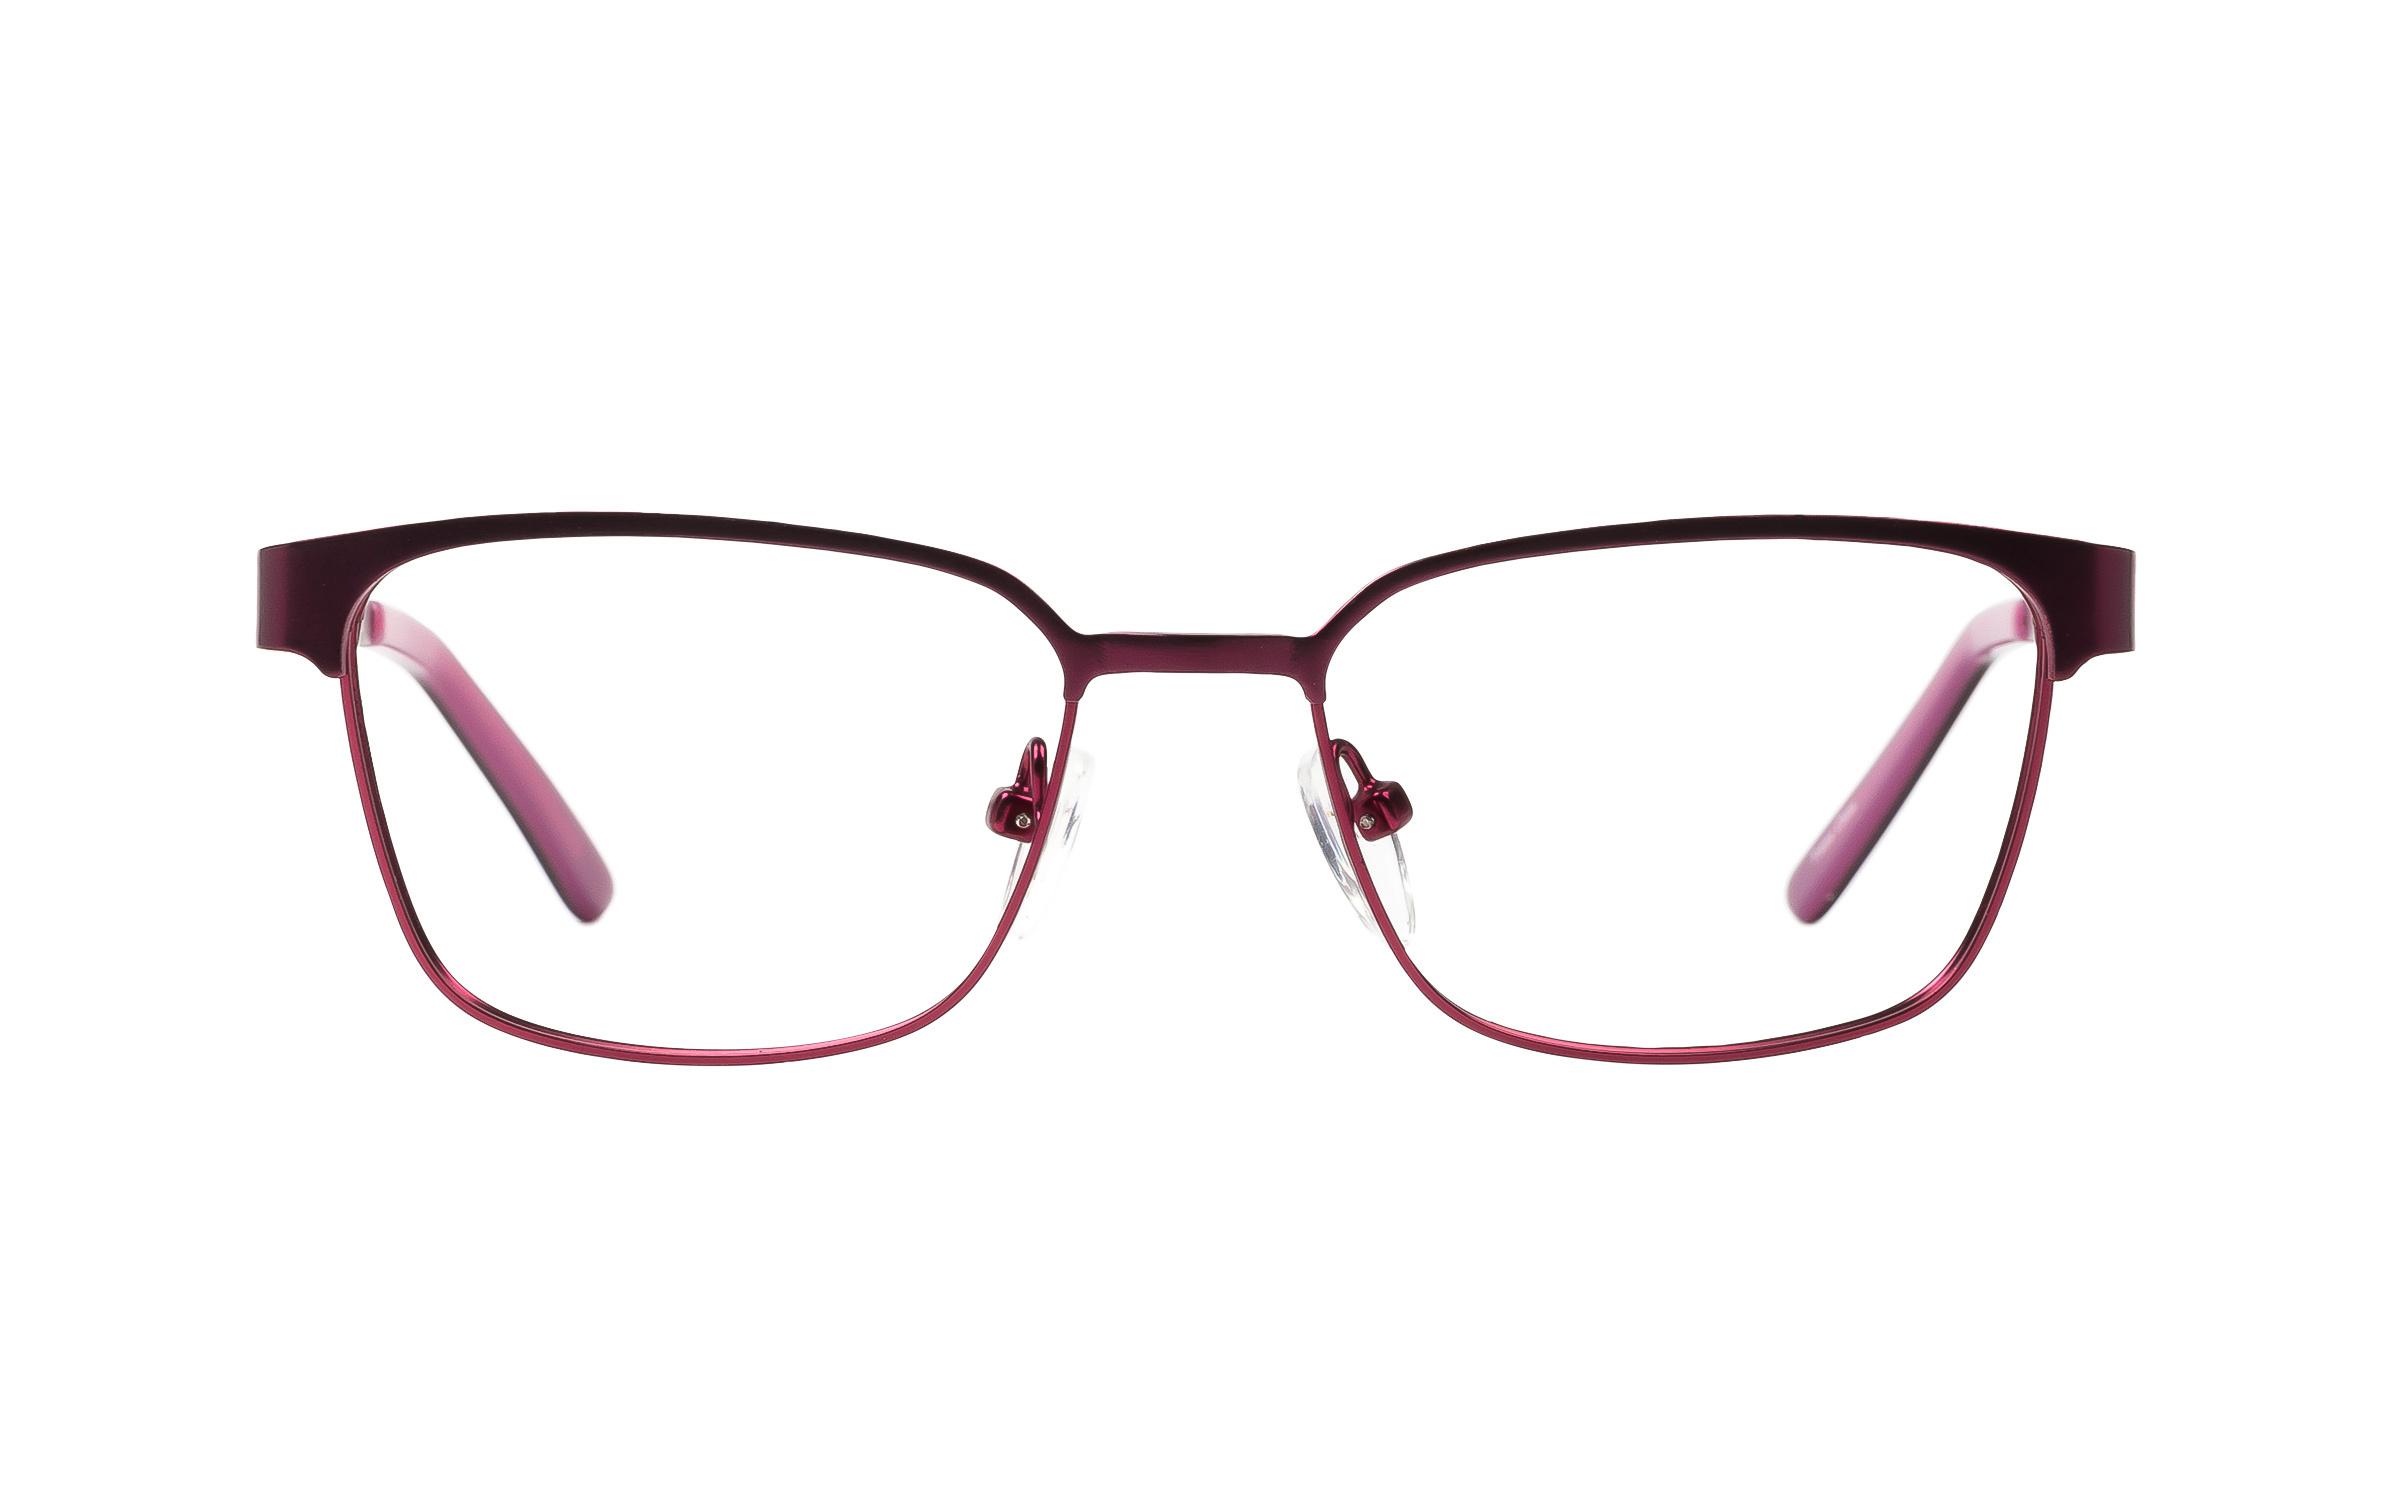 Pez Catch Purple Glasses, Eyeglasses & Frames